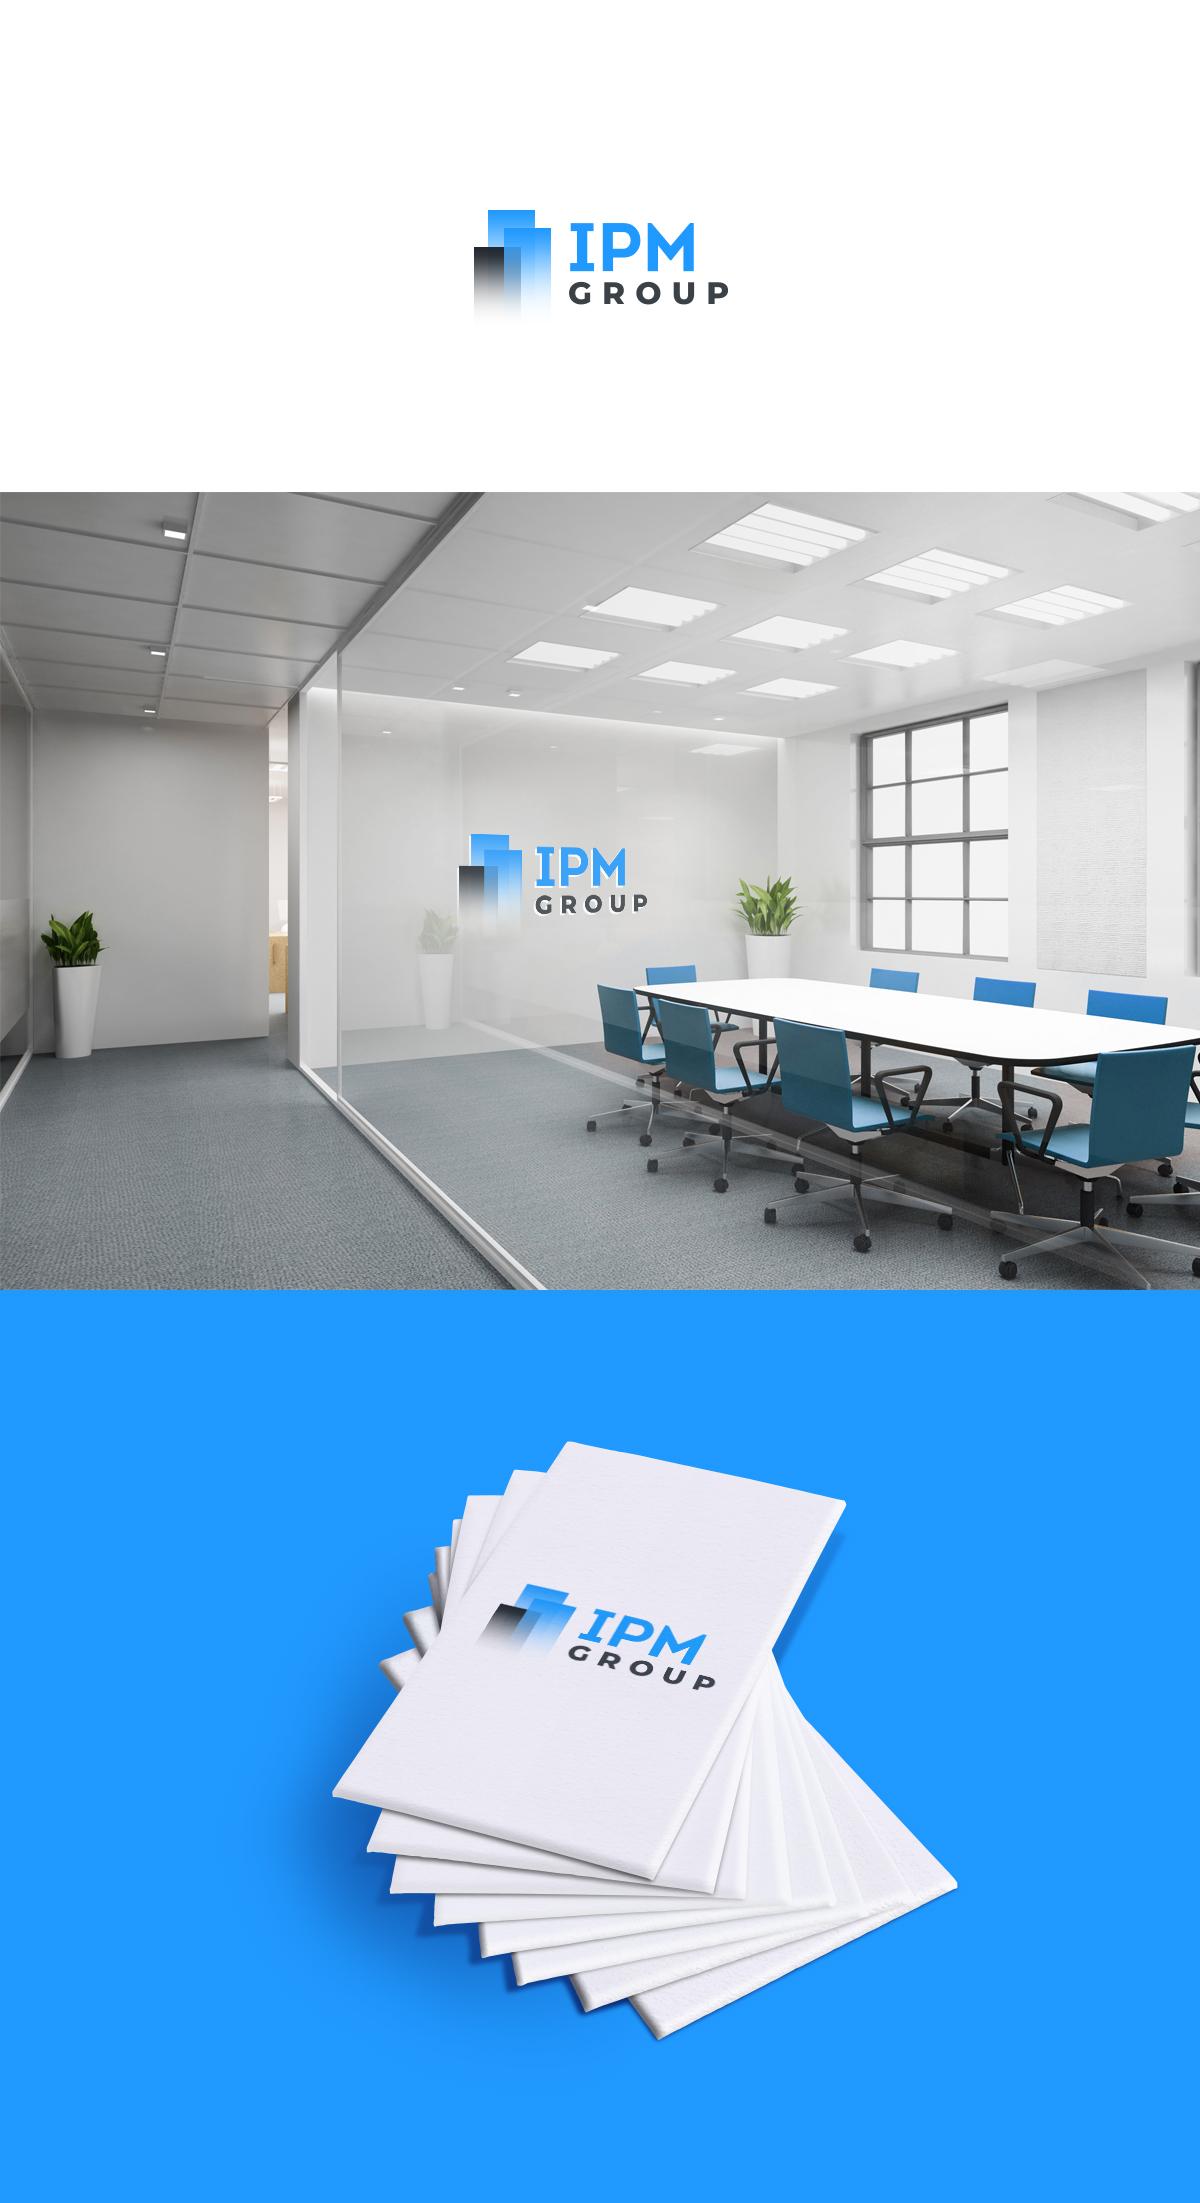 Разработка логотипа для управляющей компании фото f_6295f835d0e89233.jpg